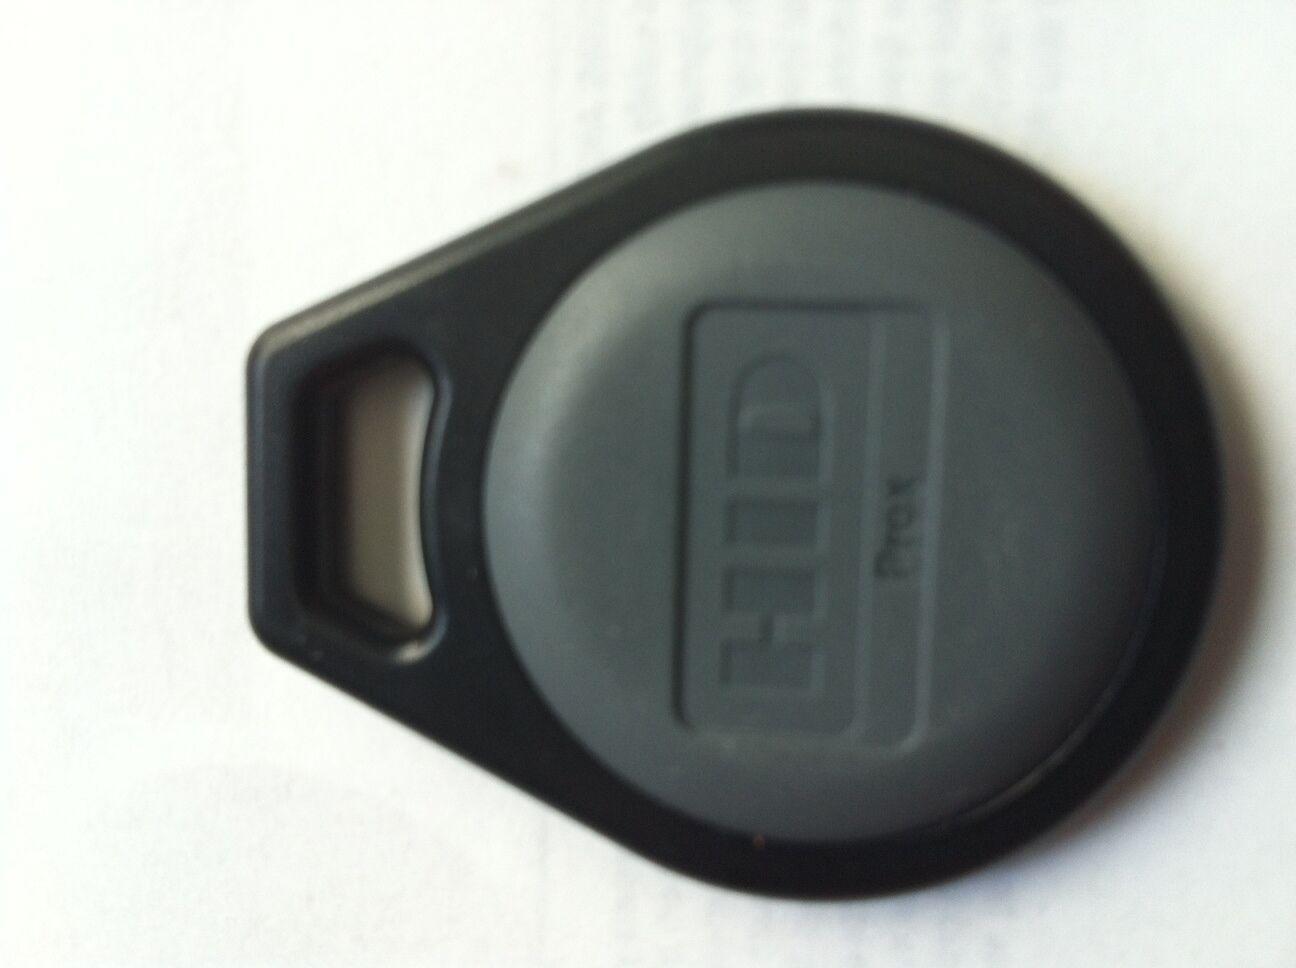 Brand Honeywell Access Px-key-h Hid Proximity Card Key 34 Bit Tag